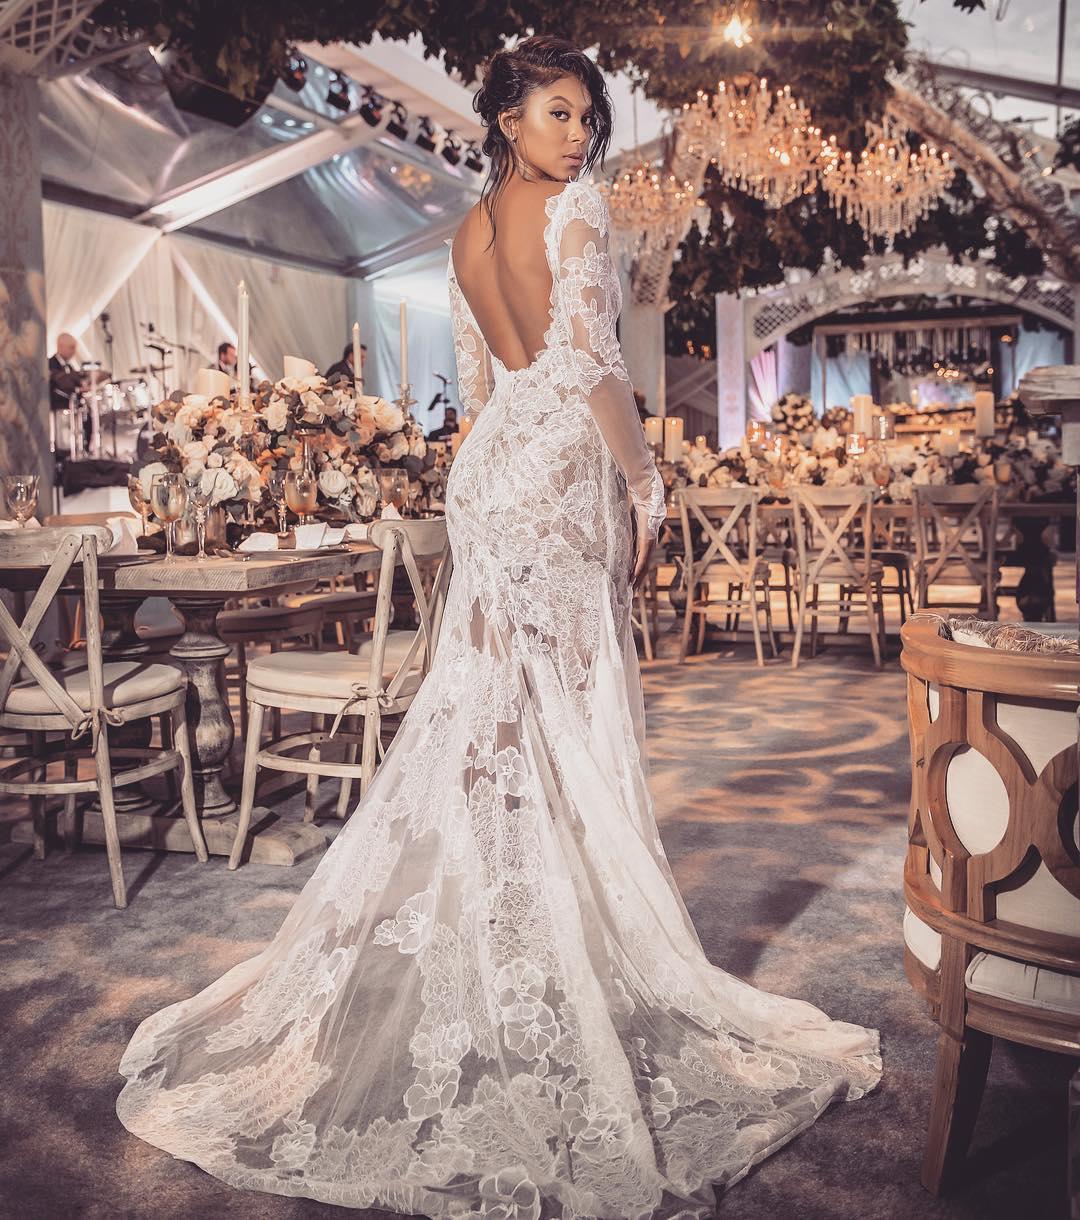 Eniko Parrish reception wedding dress